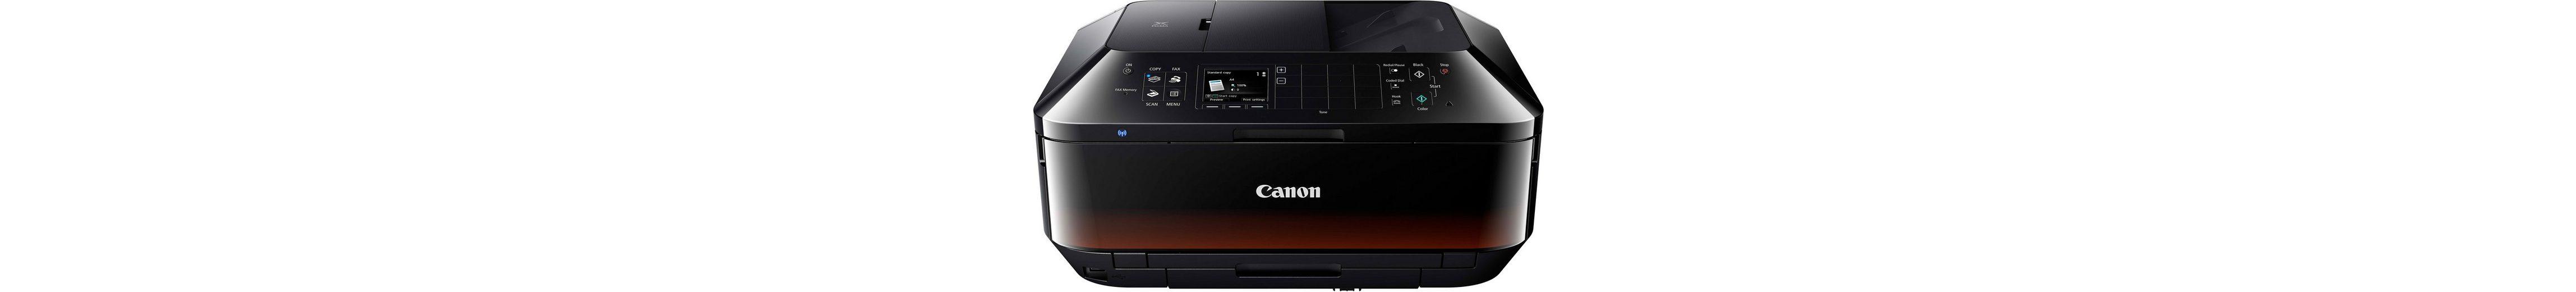 Canon PIXMA MX925 Multifunktionsdrucker